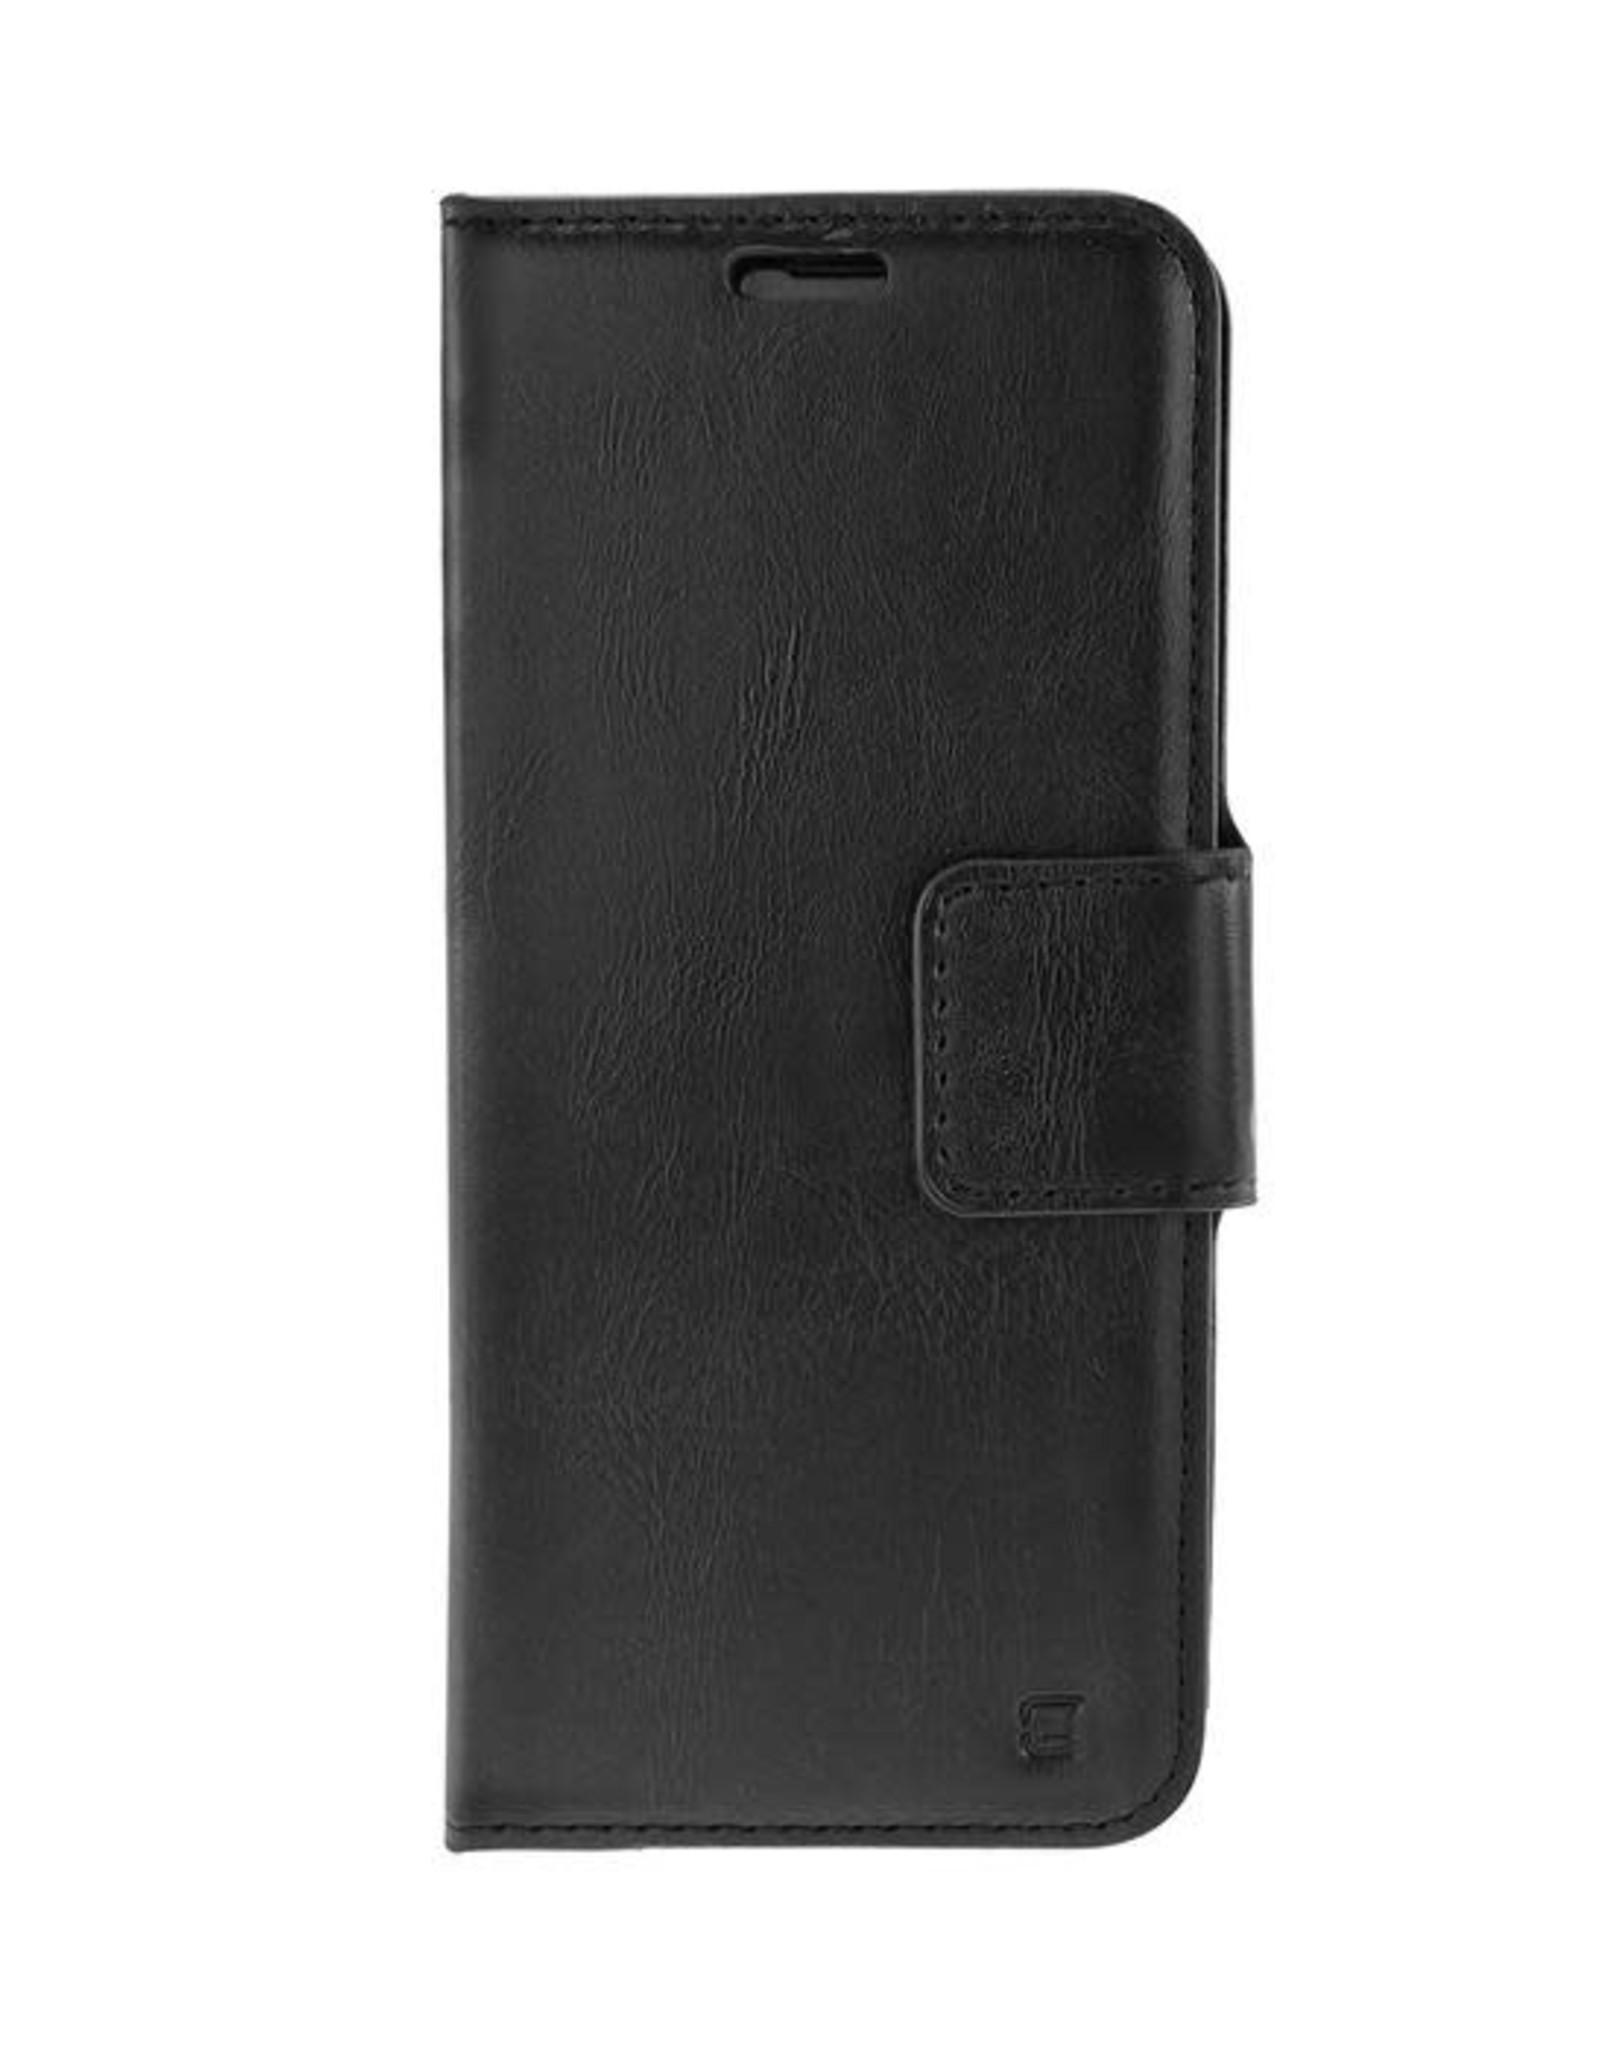 Caseco Caseco | Bond St. Dual Folio - Galaxy A8 (2018) - Black WXCC-BN-A8-BK